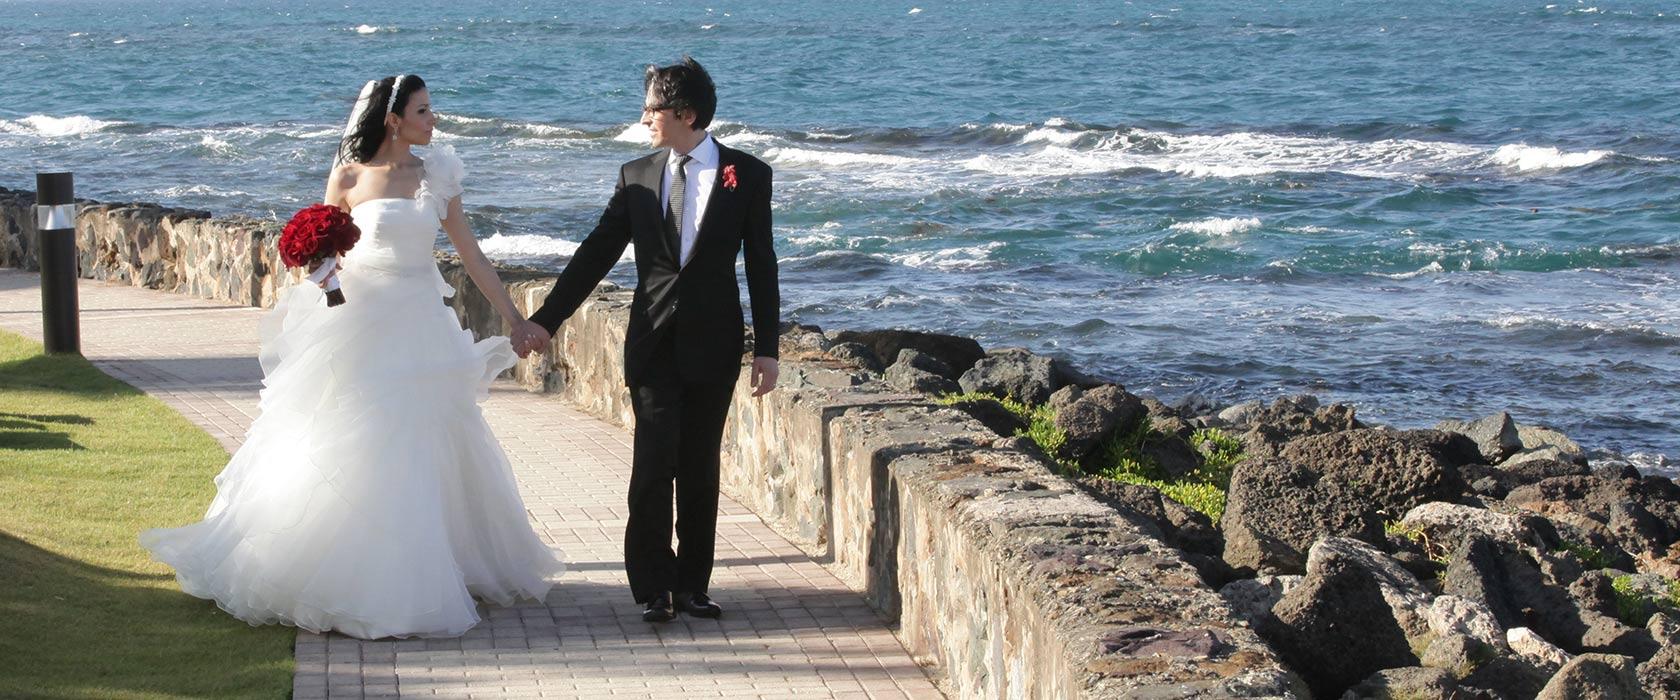 Hilton Caribbean Weddings: Caribe Hilton, San Juan Beach Wedding